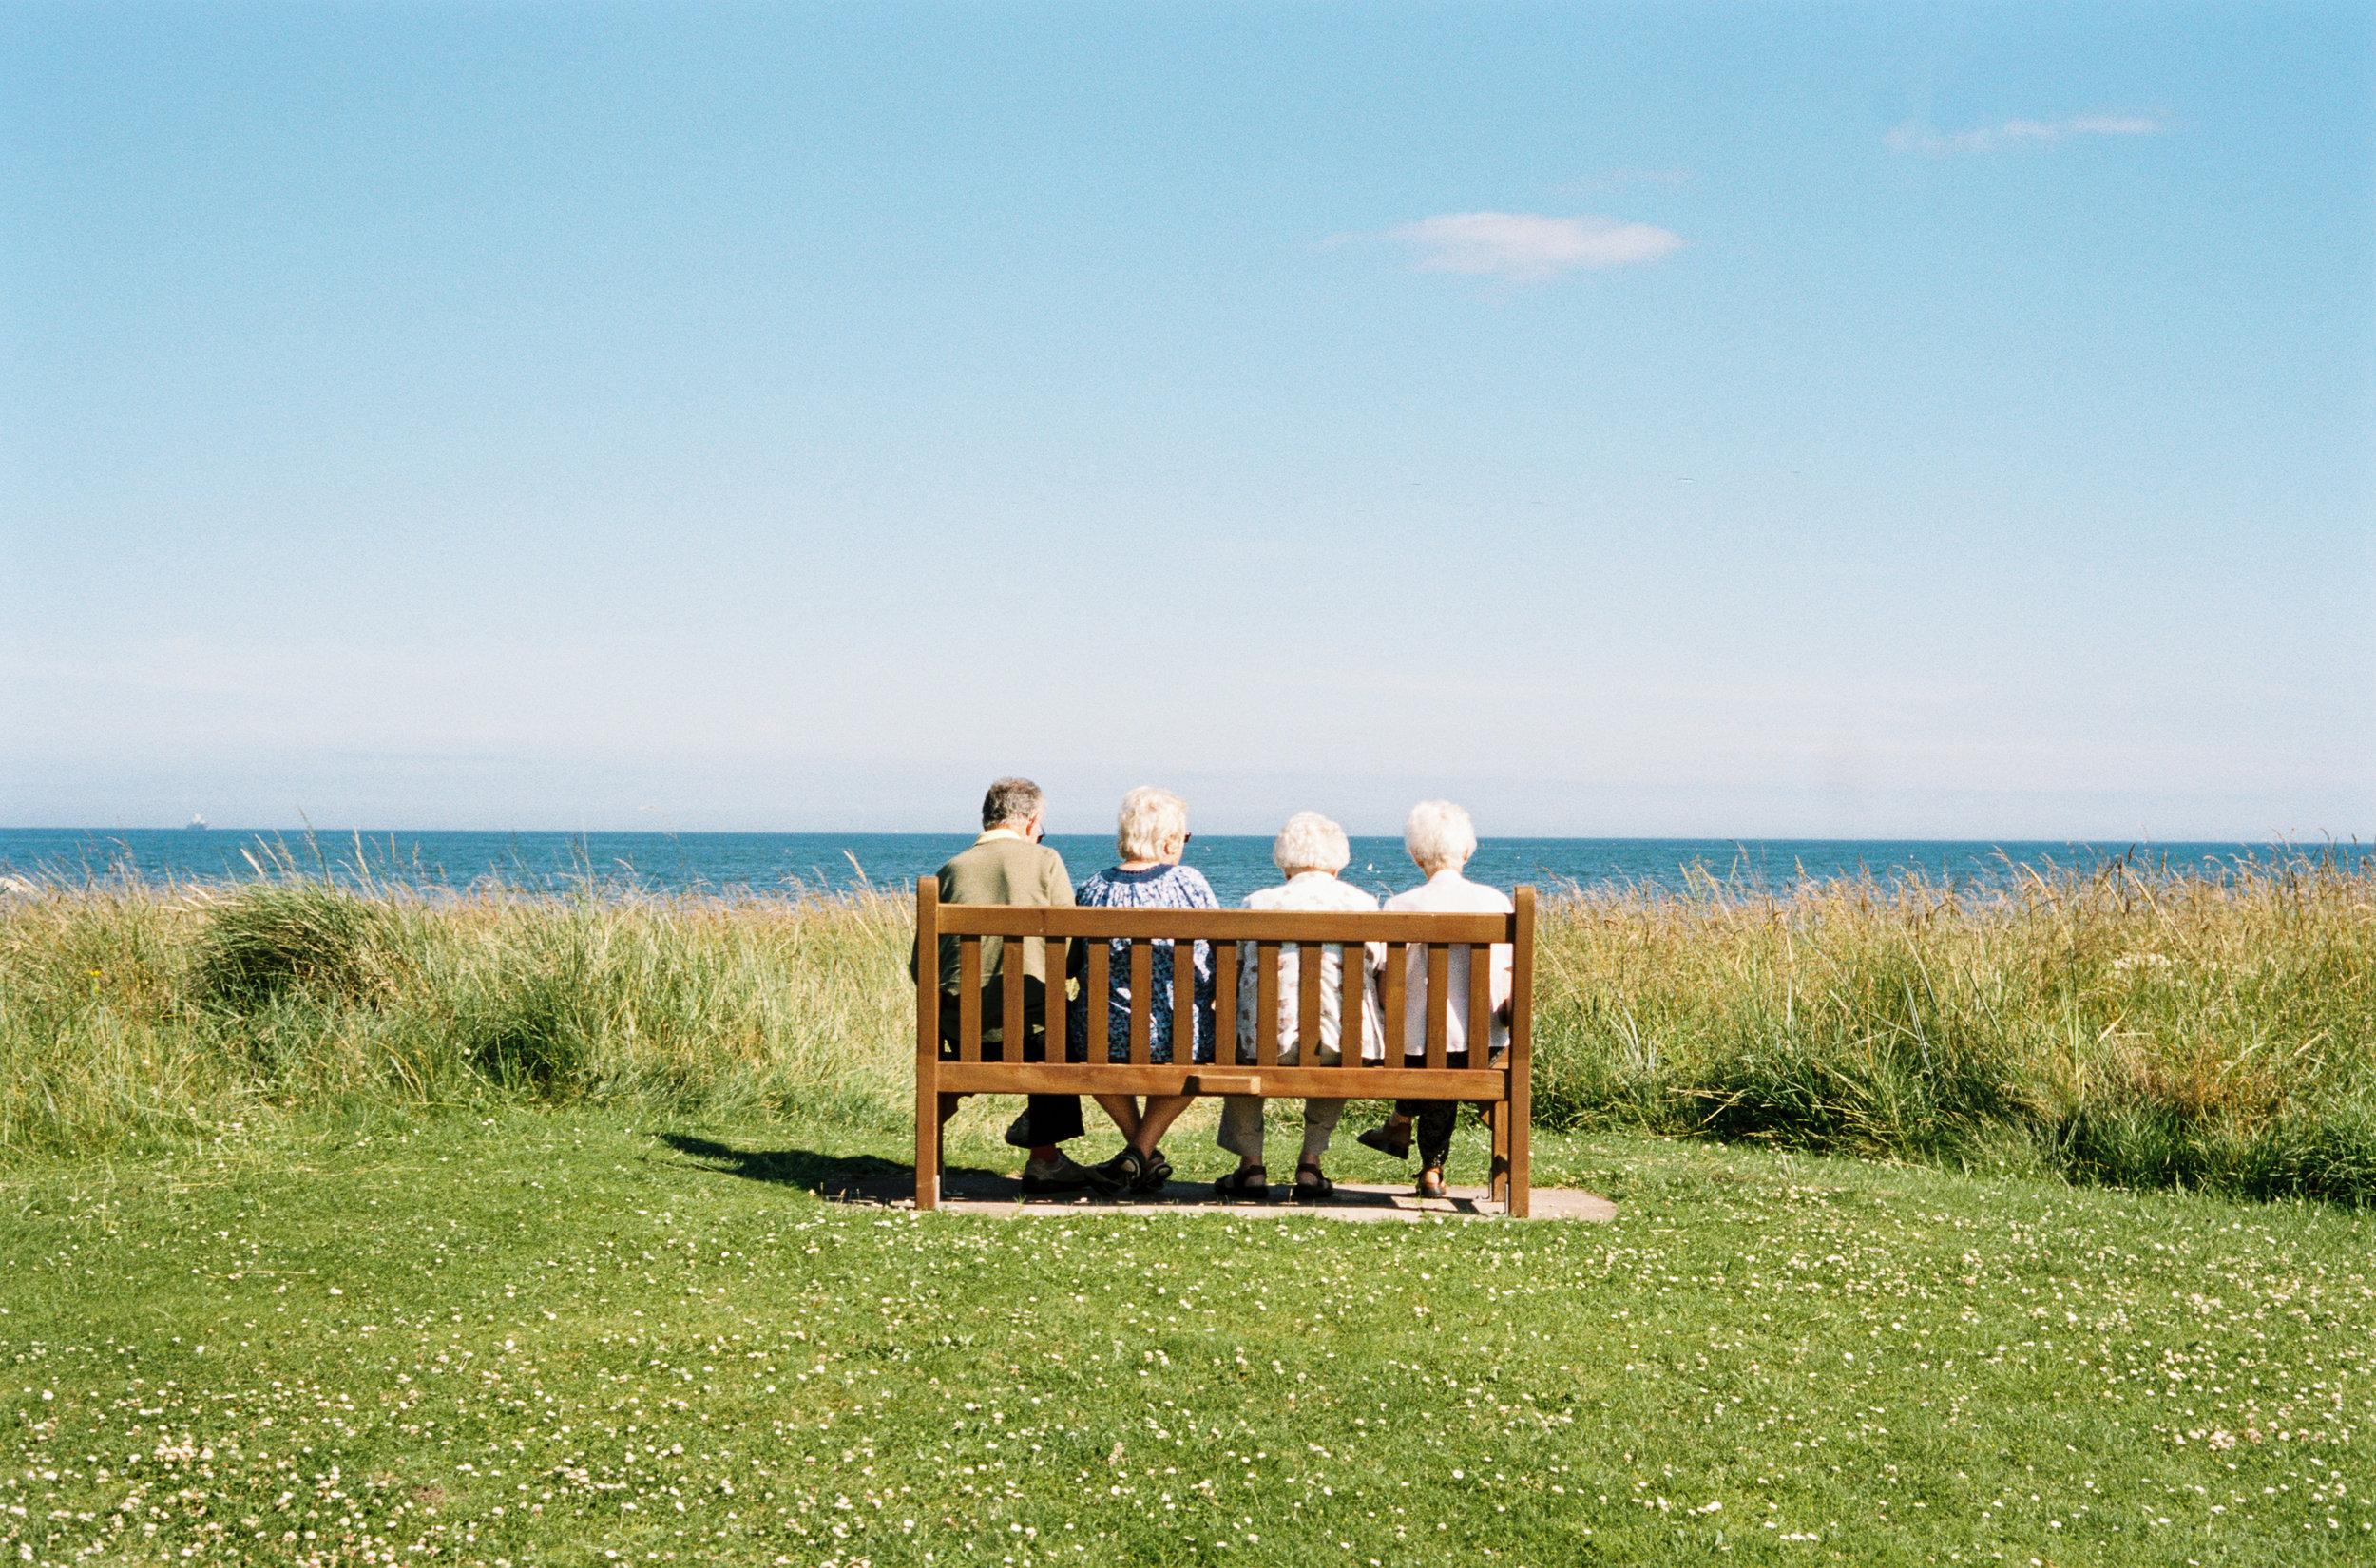 Enjoy The Simple Things | Portra 160 | Leica M4 | 50mm F1.4 | Michael Rennie